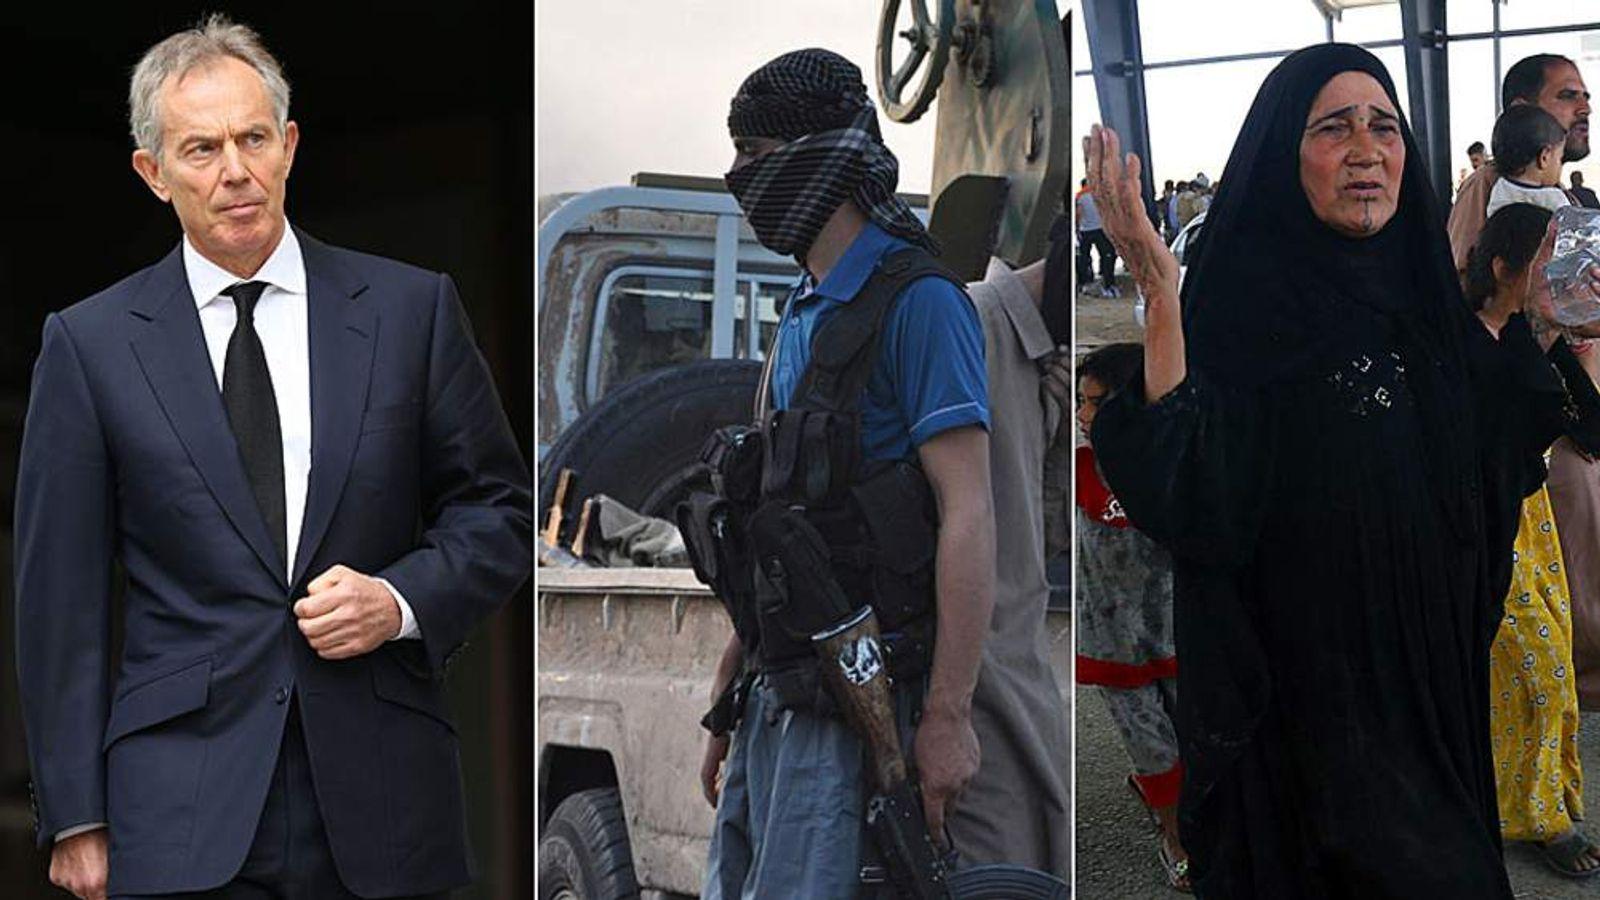 (L-R) Tony Blair, ISIS militant and Iraqi civilian